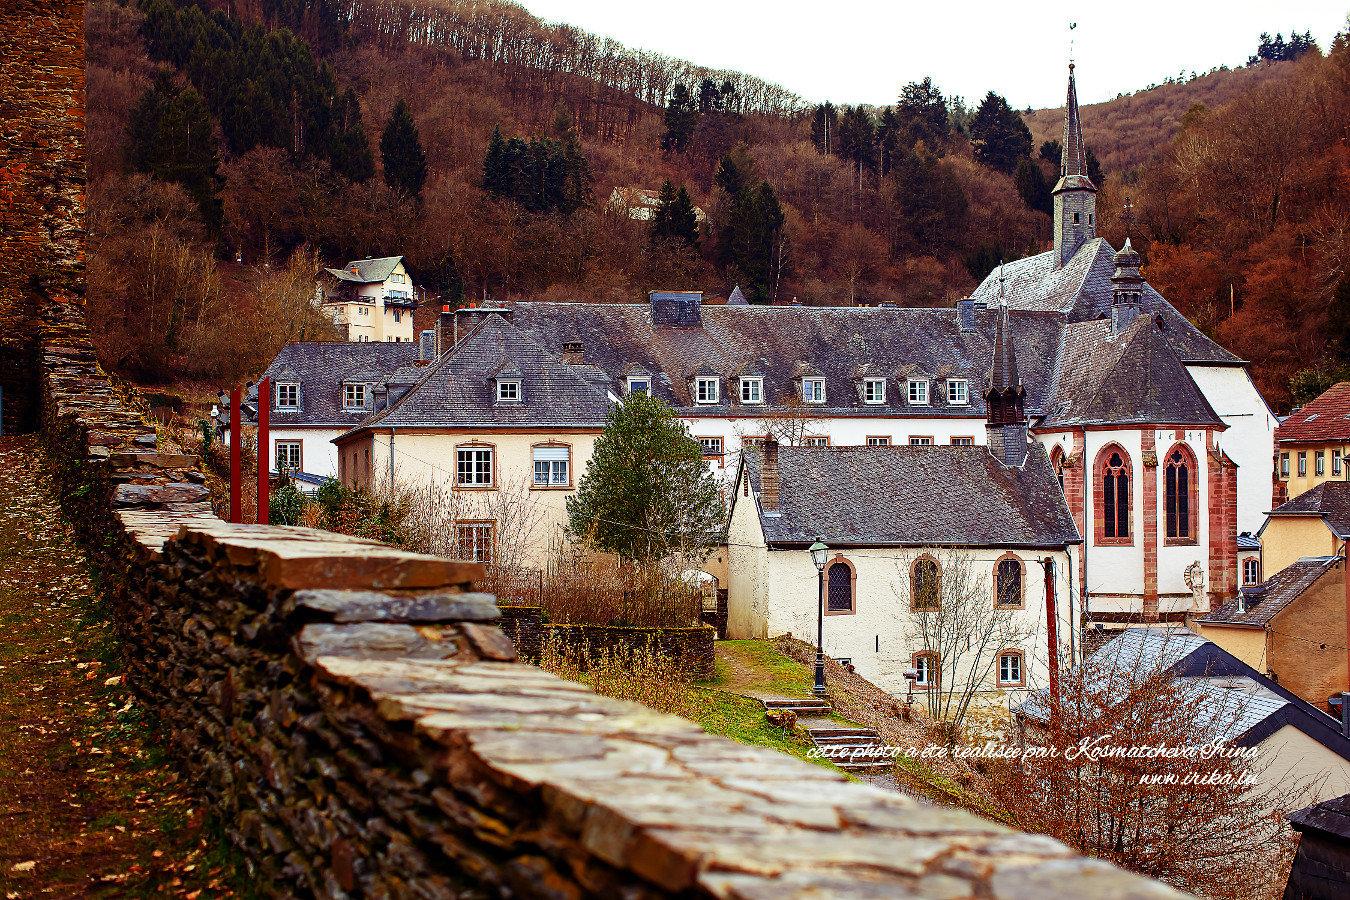 Petite-ville-luxembourgeoise